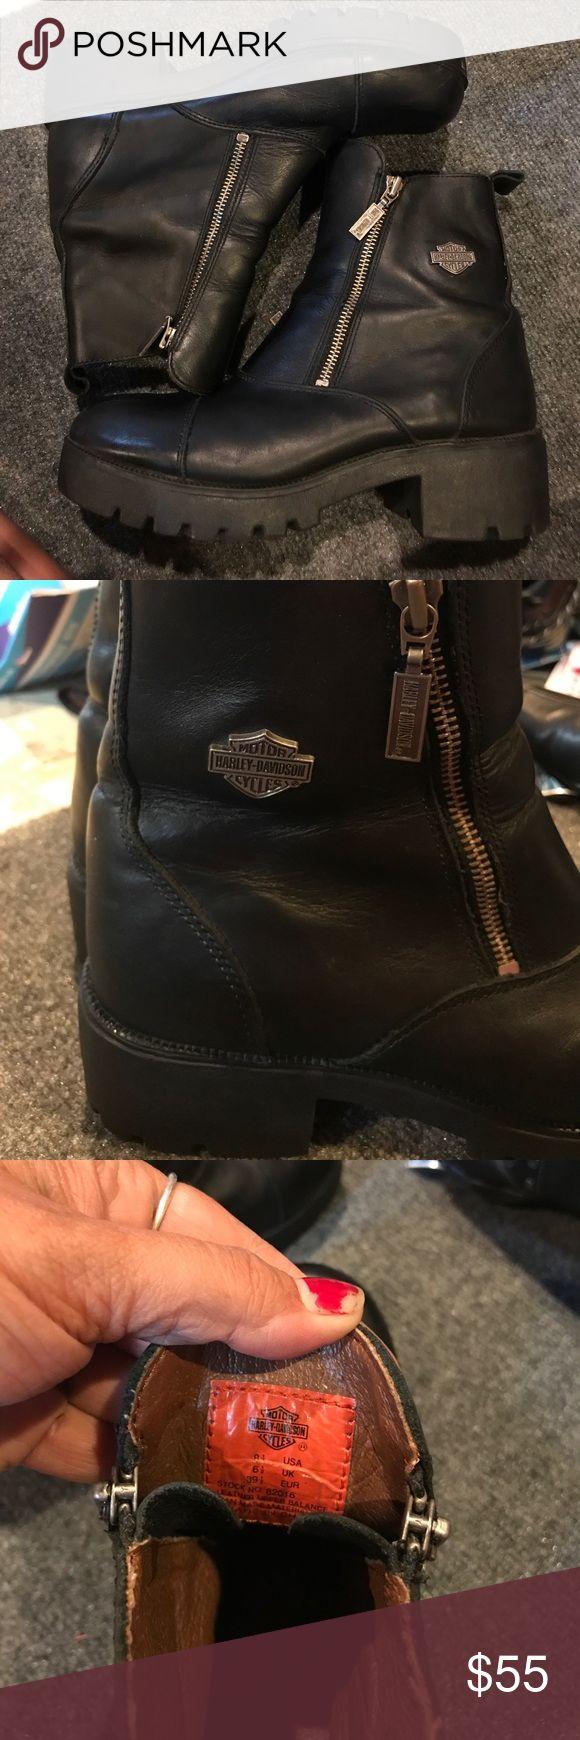 Harley Davison black leather boots Good condition. Harley Davidson leather boots. Broken in and ready to ride! Harley-Davidson Shoes Ankle Boots & Booties